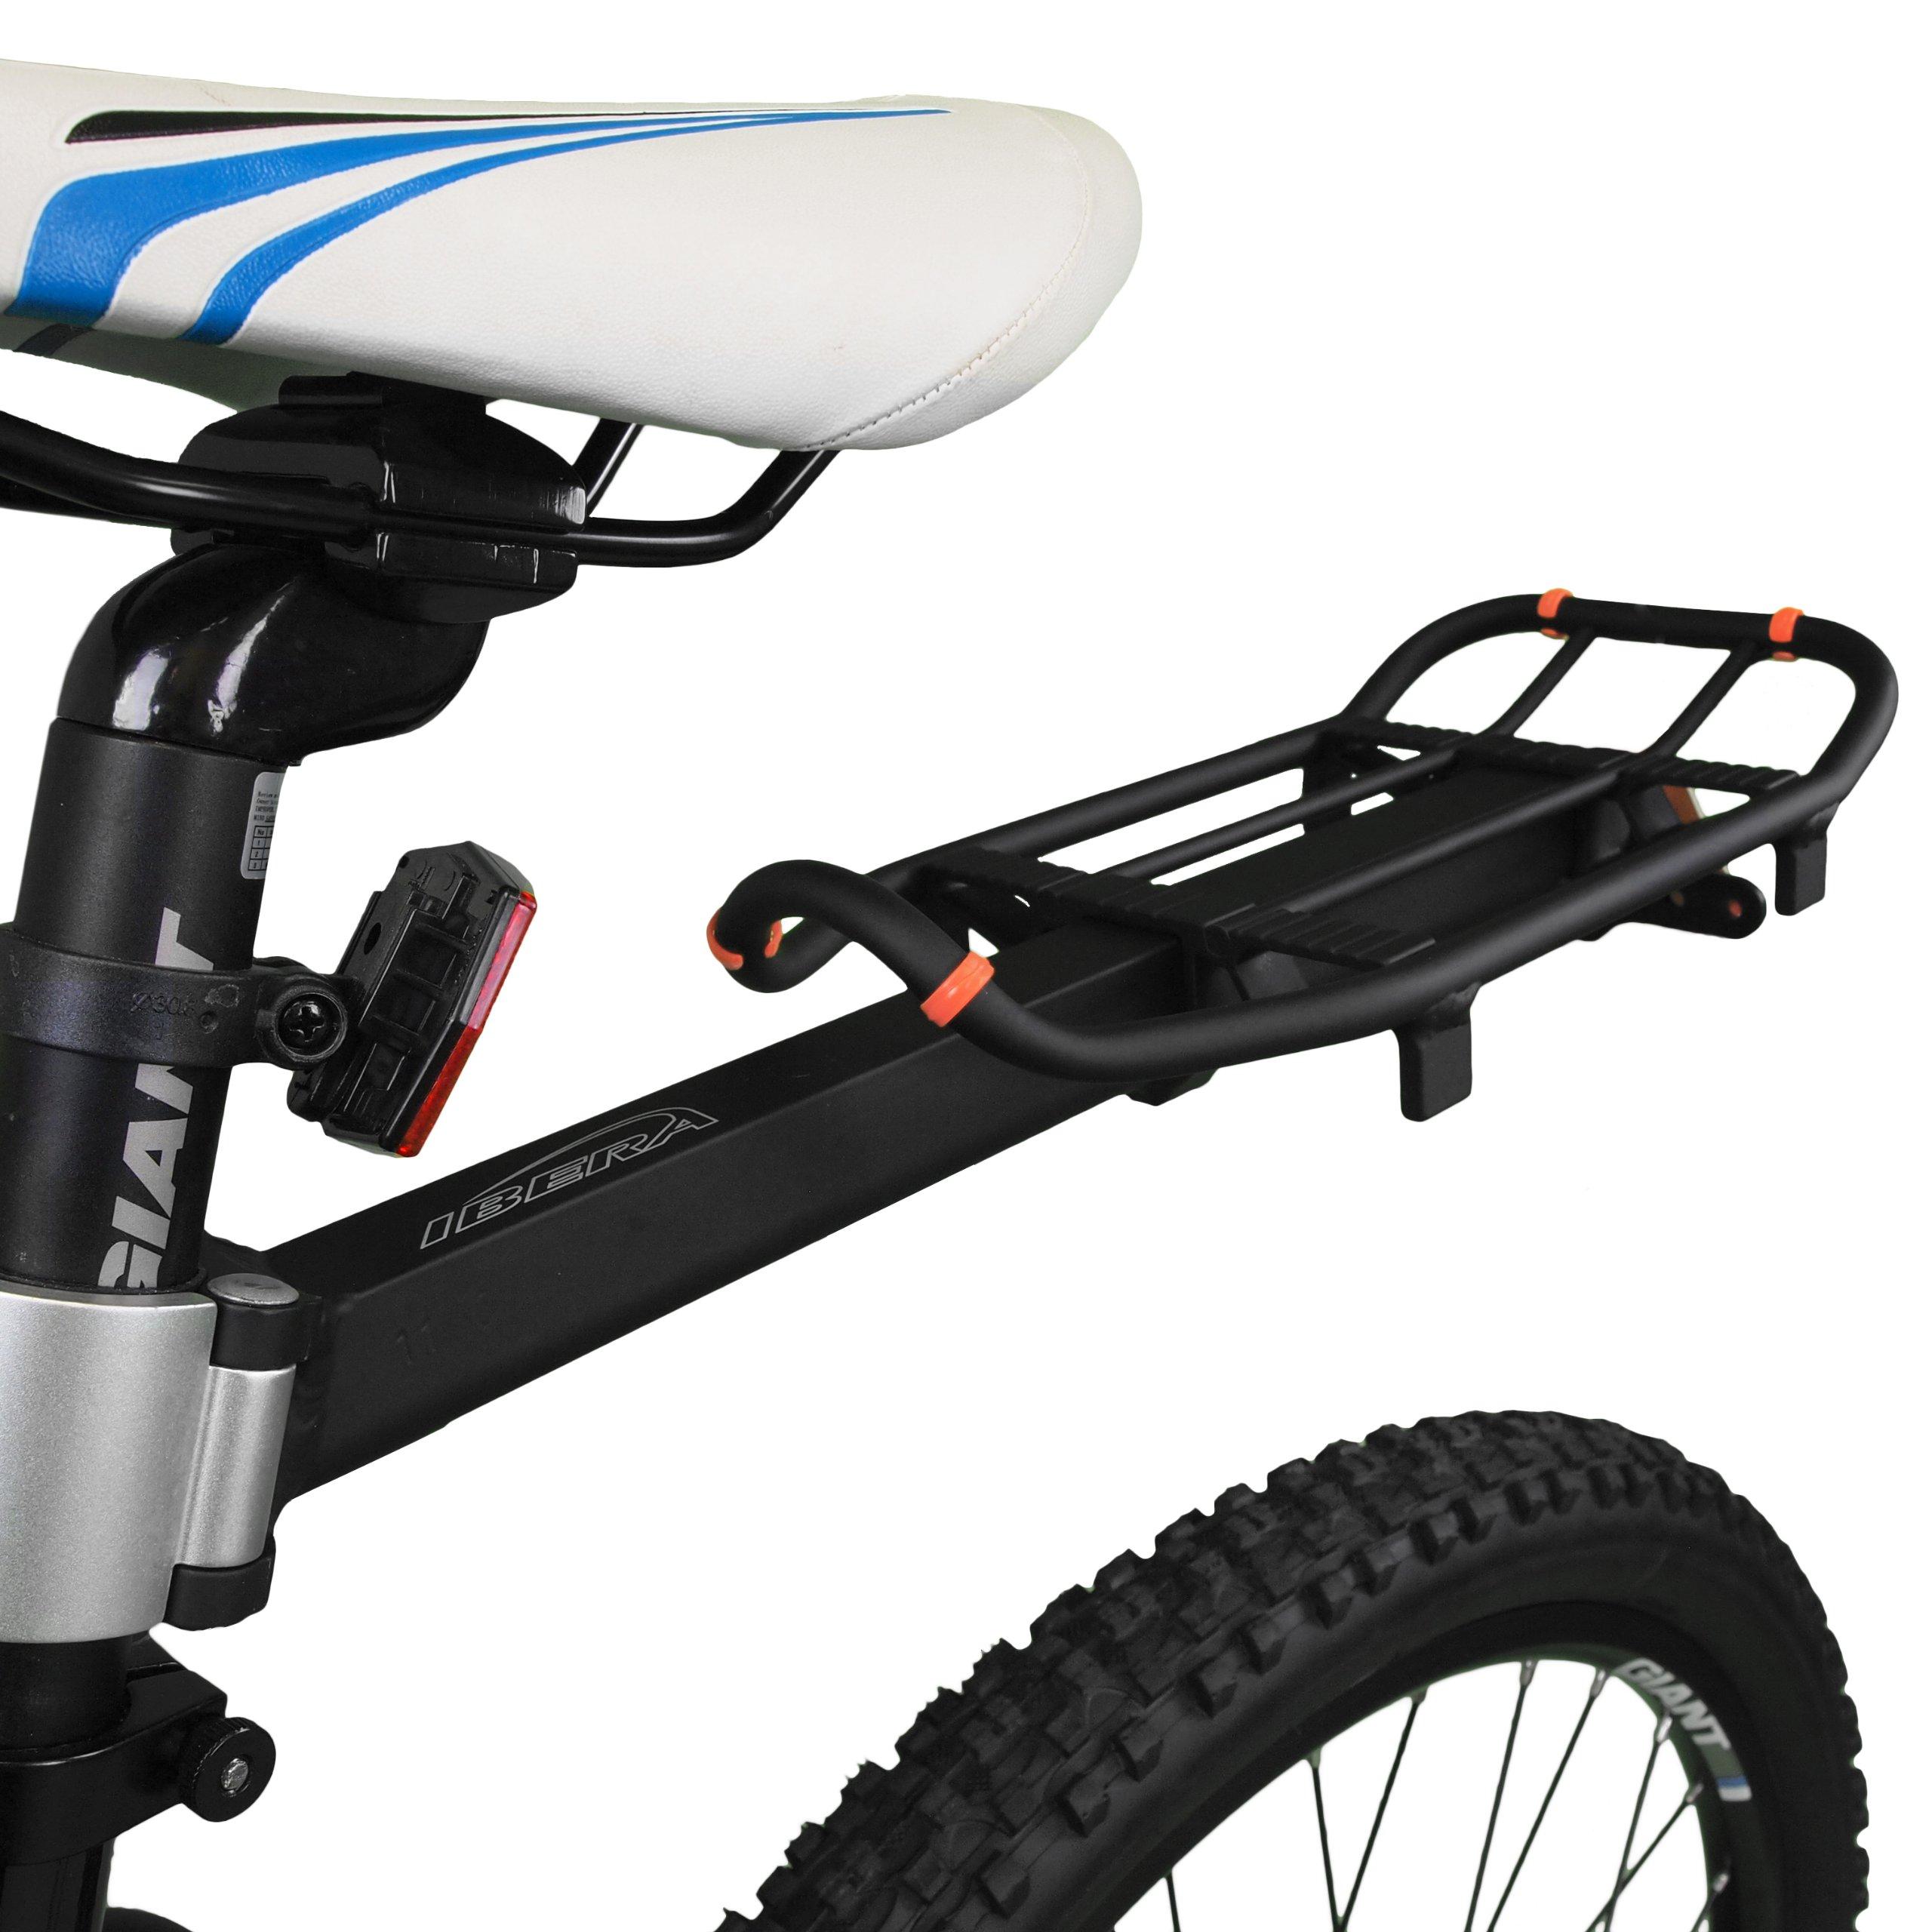 Ibera PakRak Mini Commuter Bicycle Carrier Rack